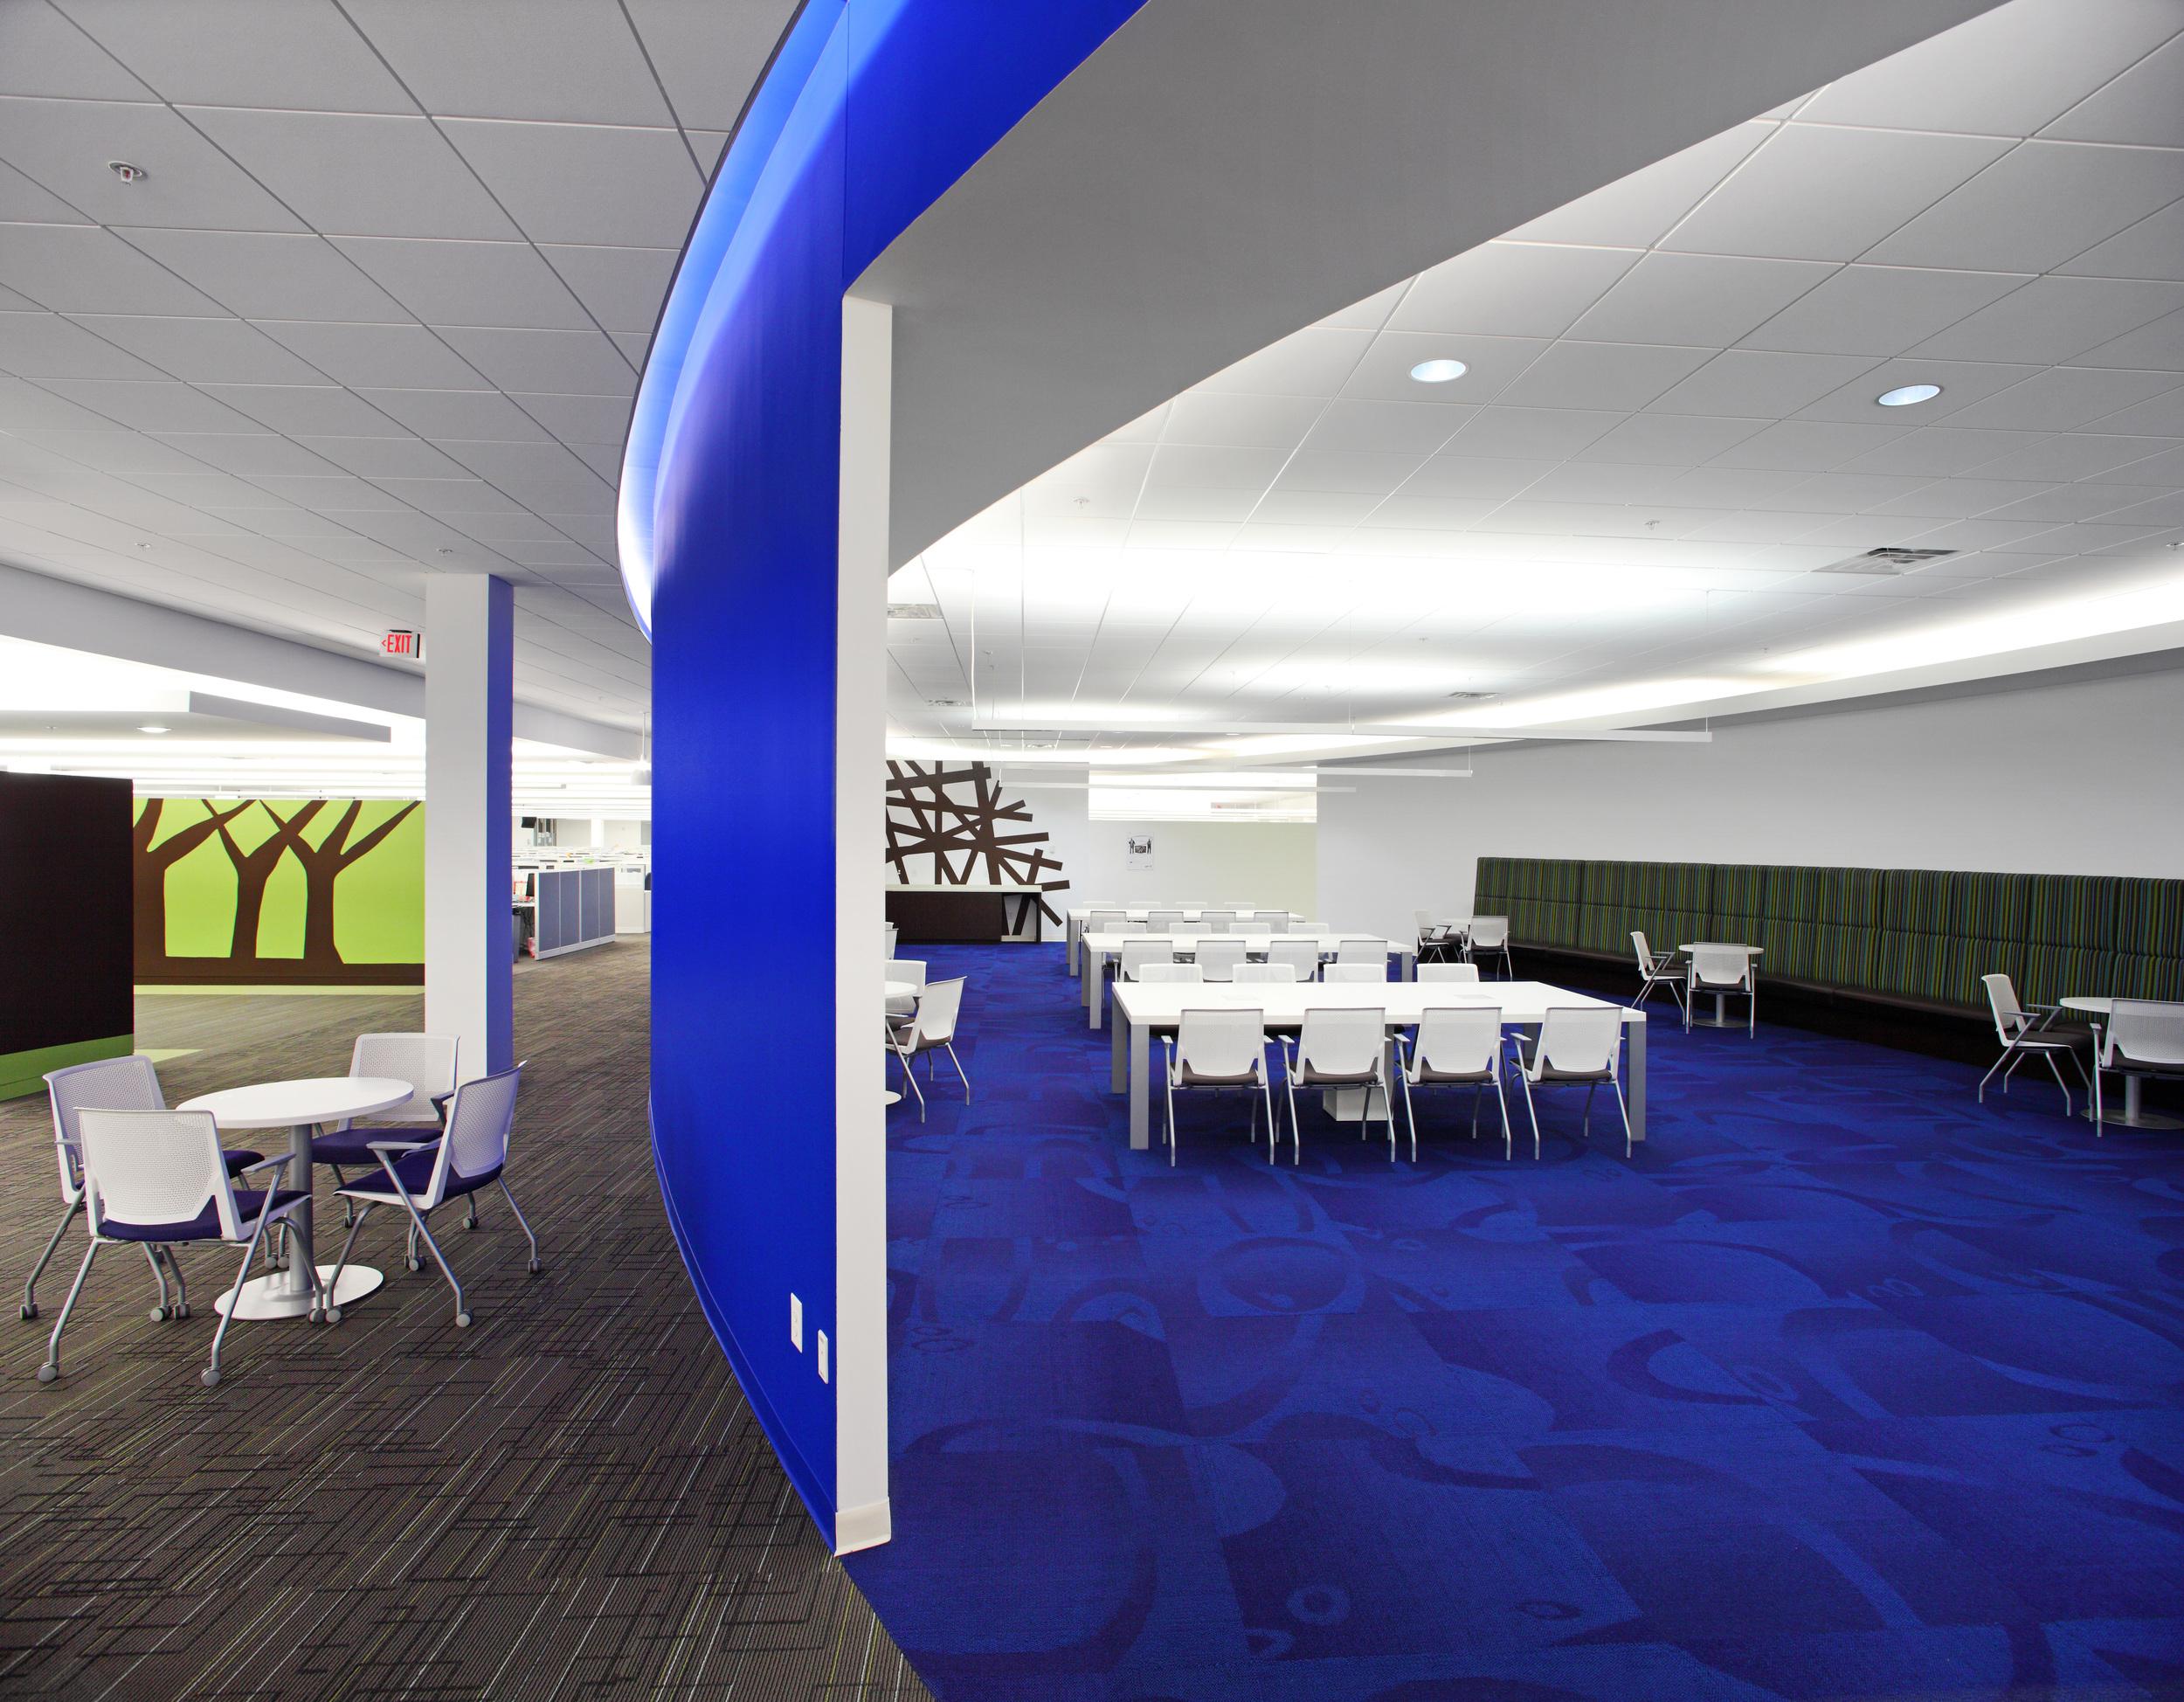 Samsung SC - Oval Room 1.jpg